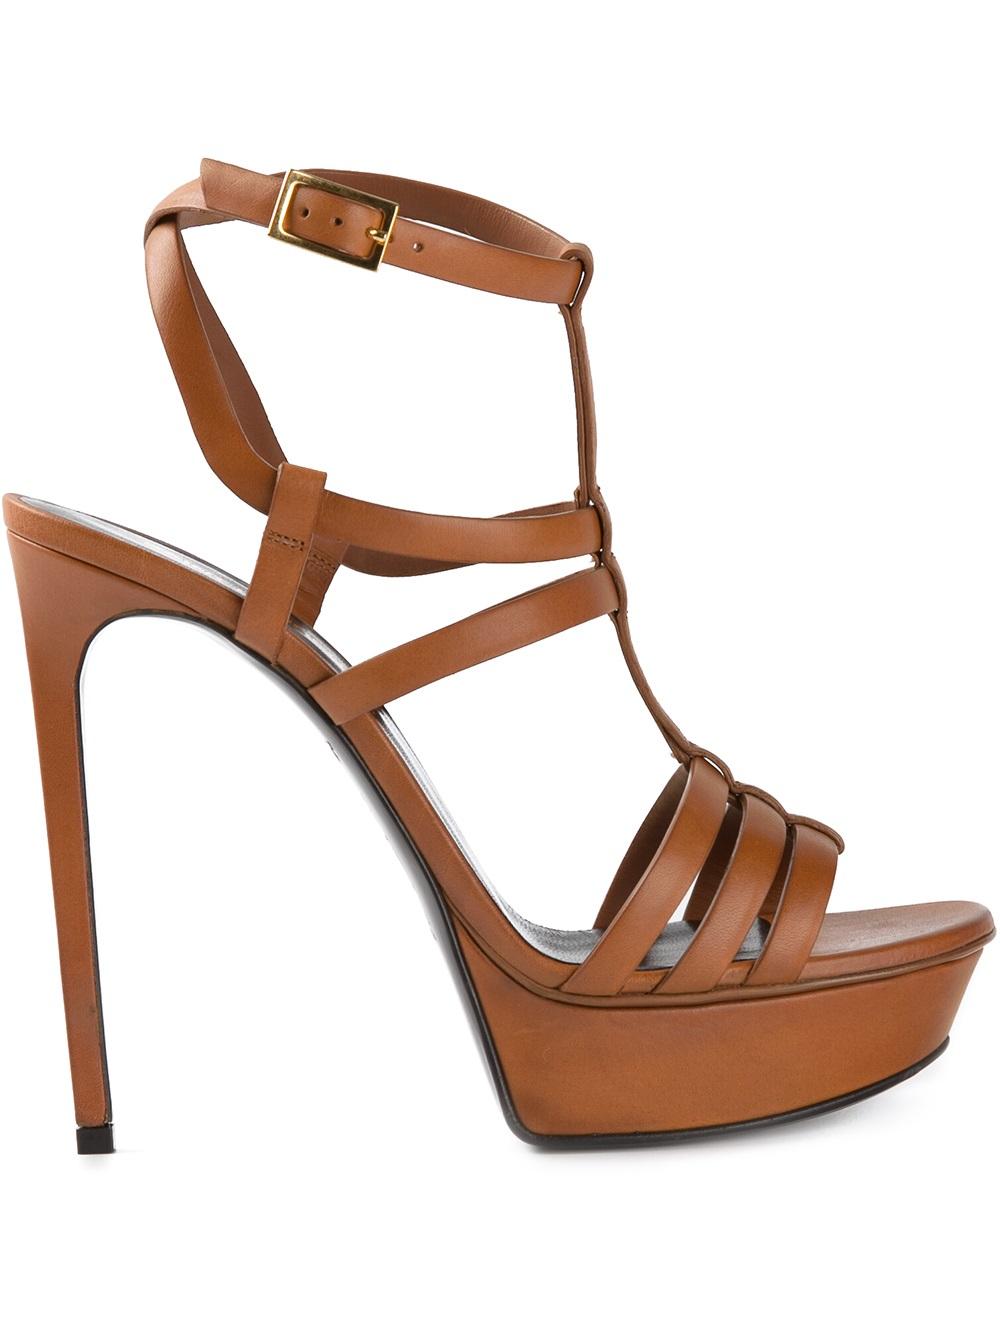 3a39f2d2470 Lyst - Saint Laurent Strappy Platform Sandals in Brown